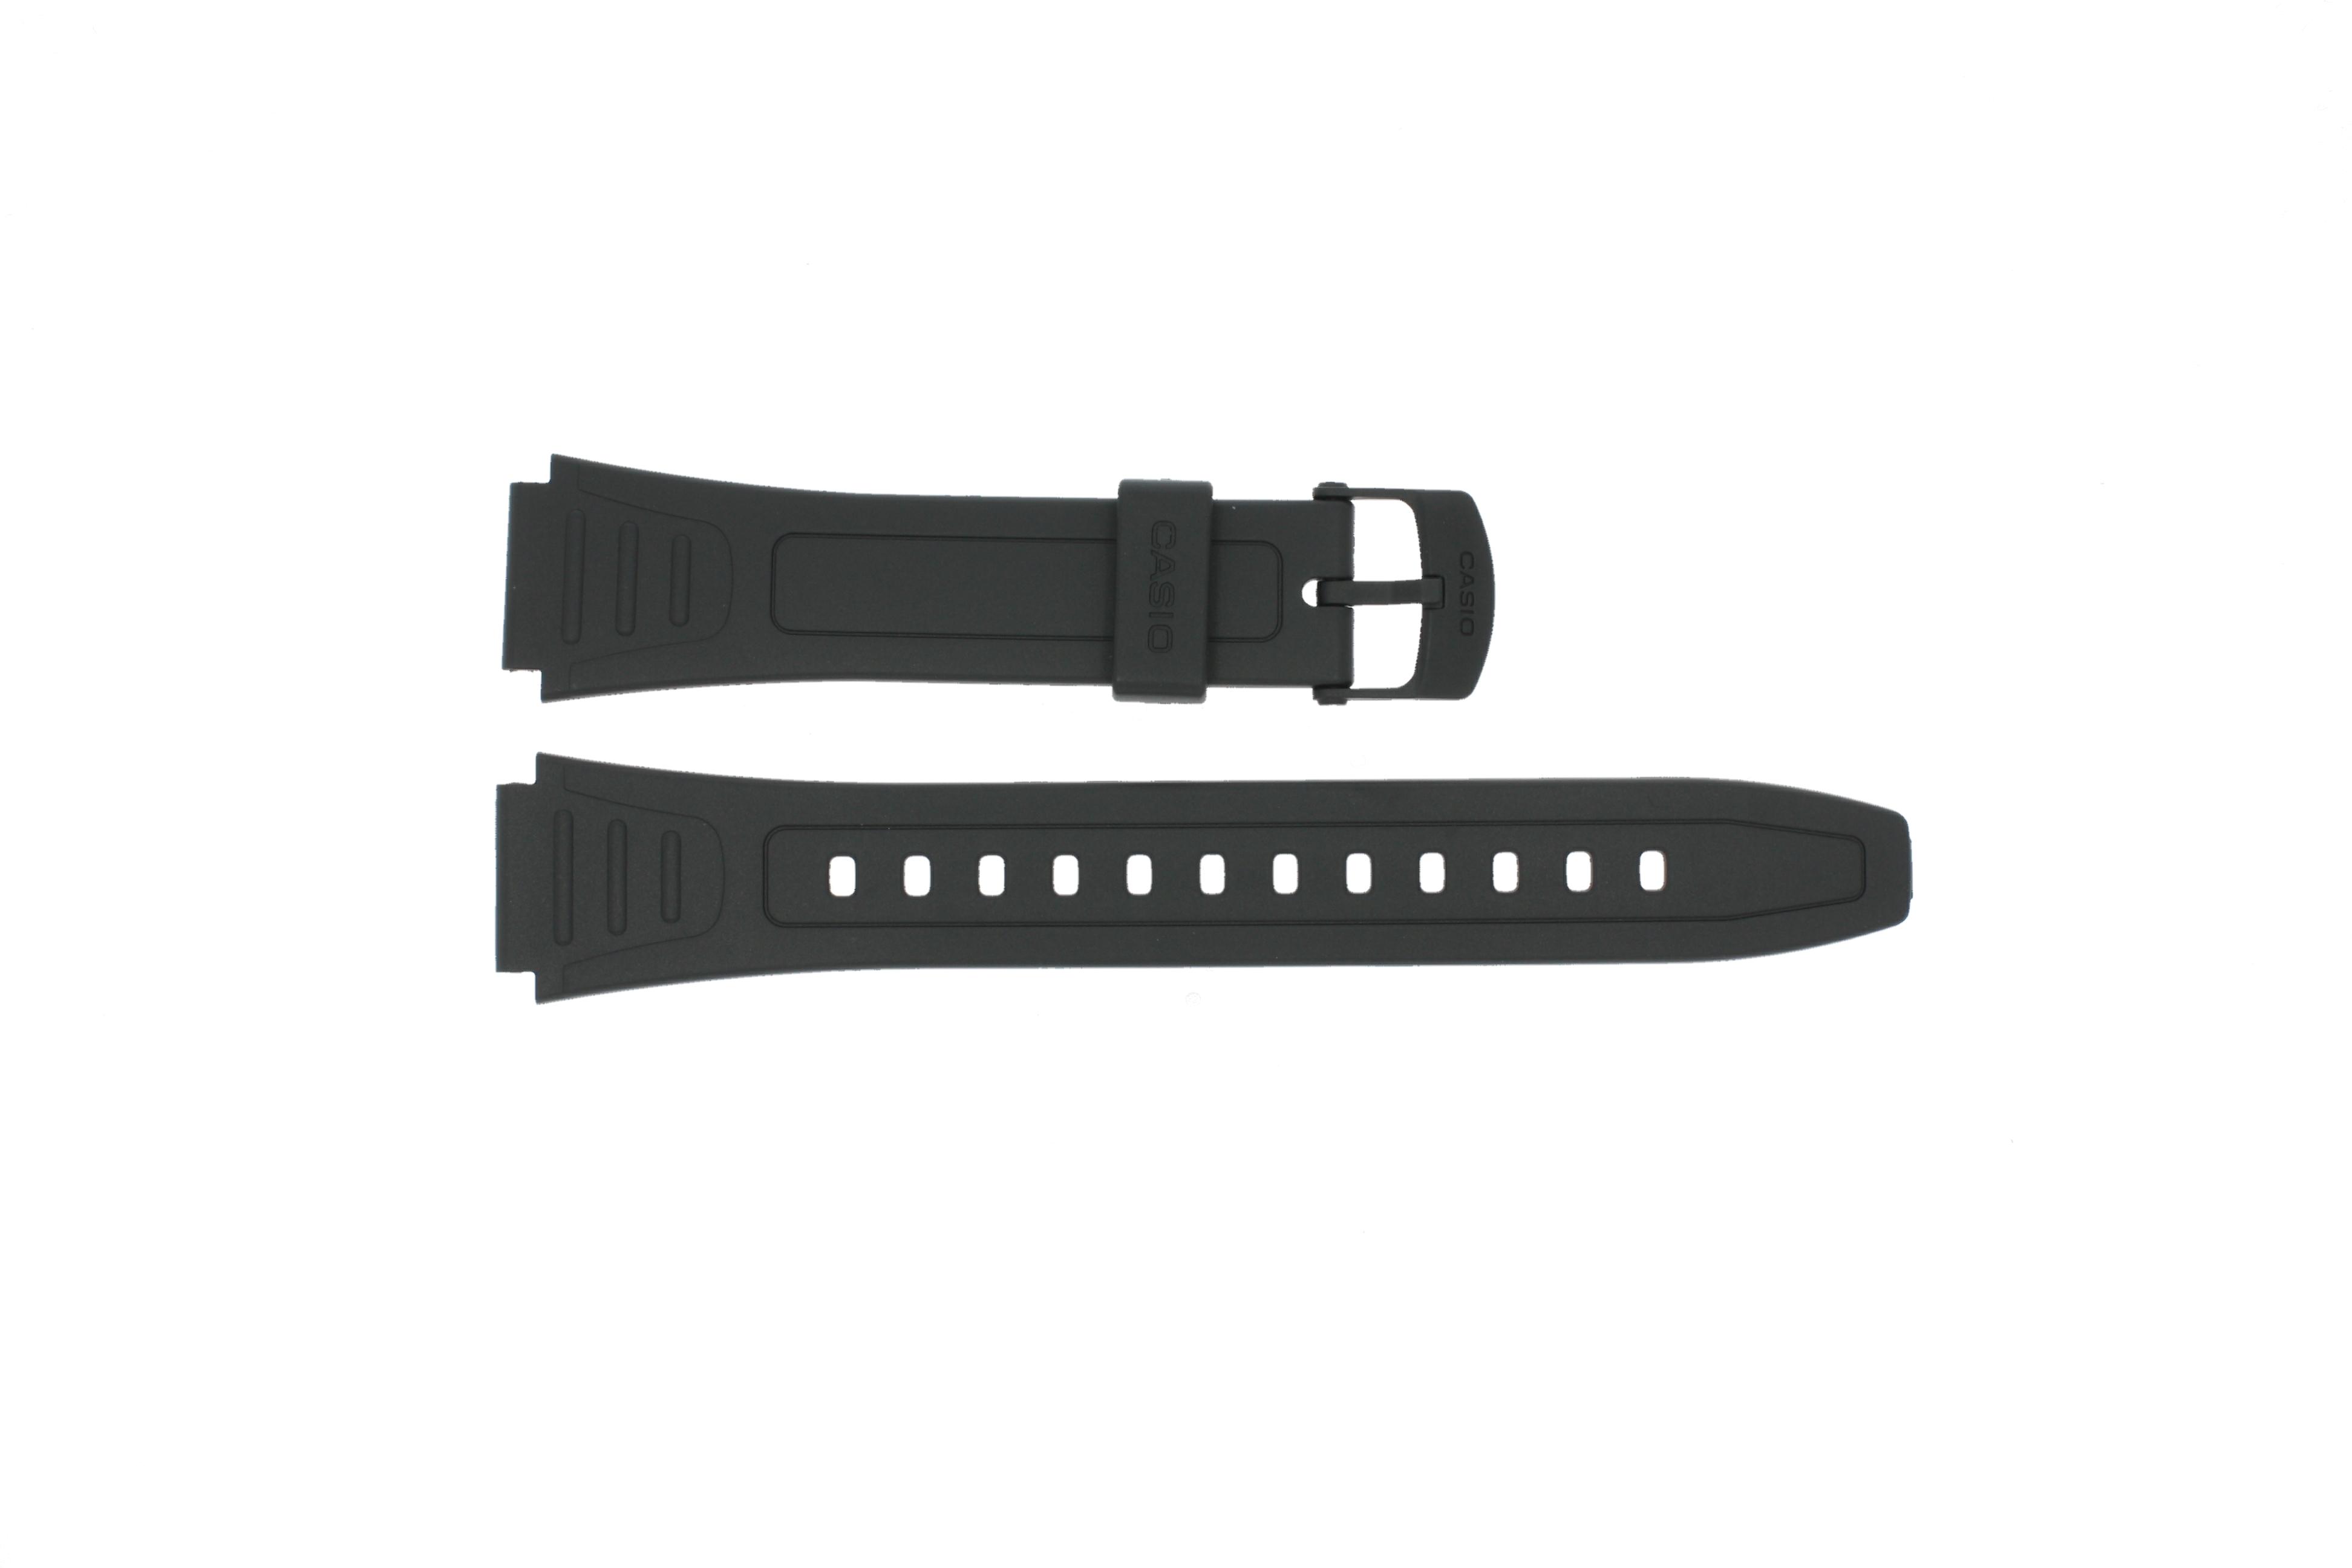 Casio klockarmband 10268612 Plast Svart 18mm